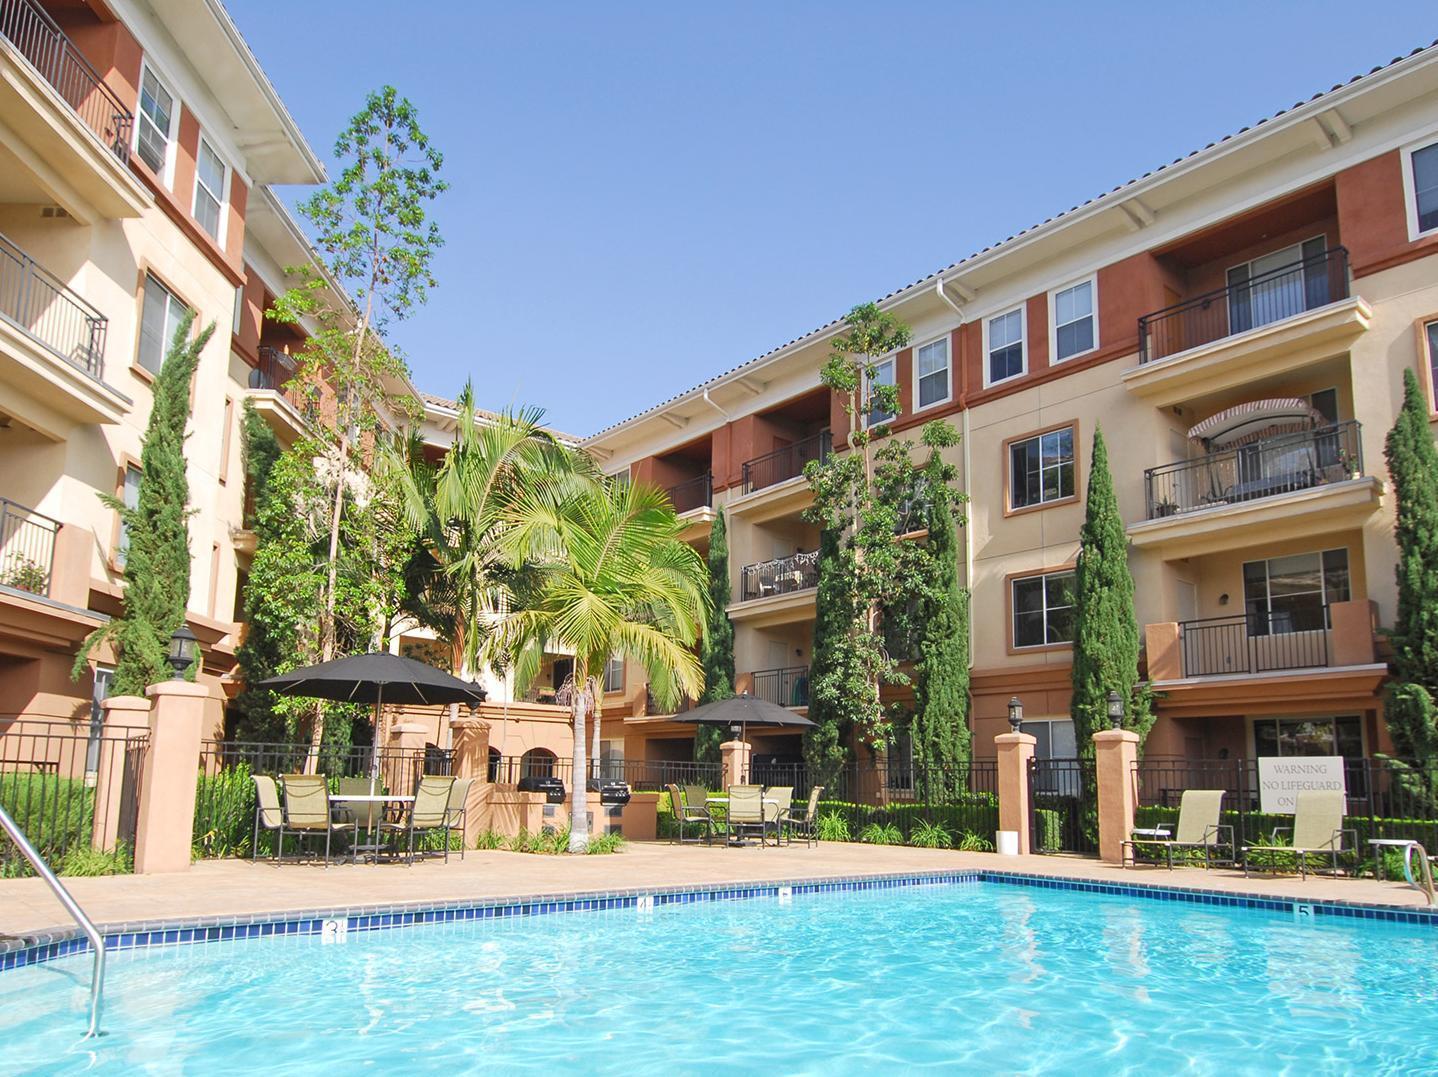 Regent Court Holiday Apartments - Hotell och Boende i Australien , Guldkusten